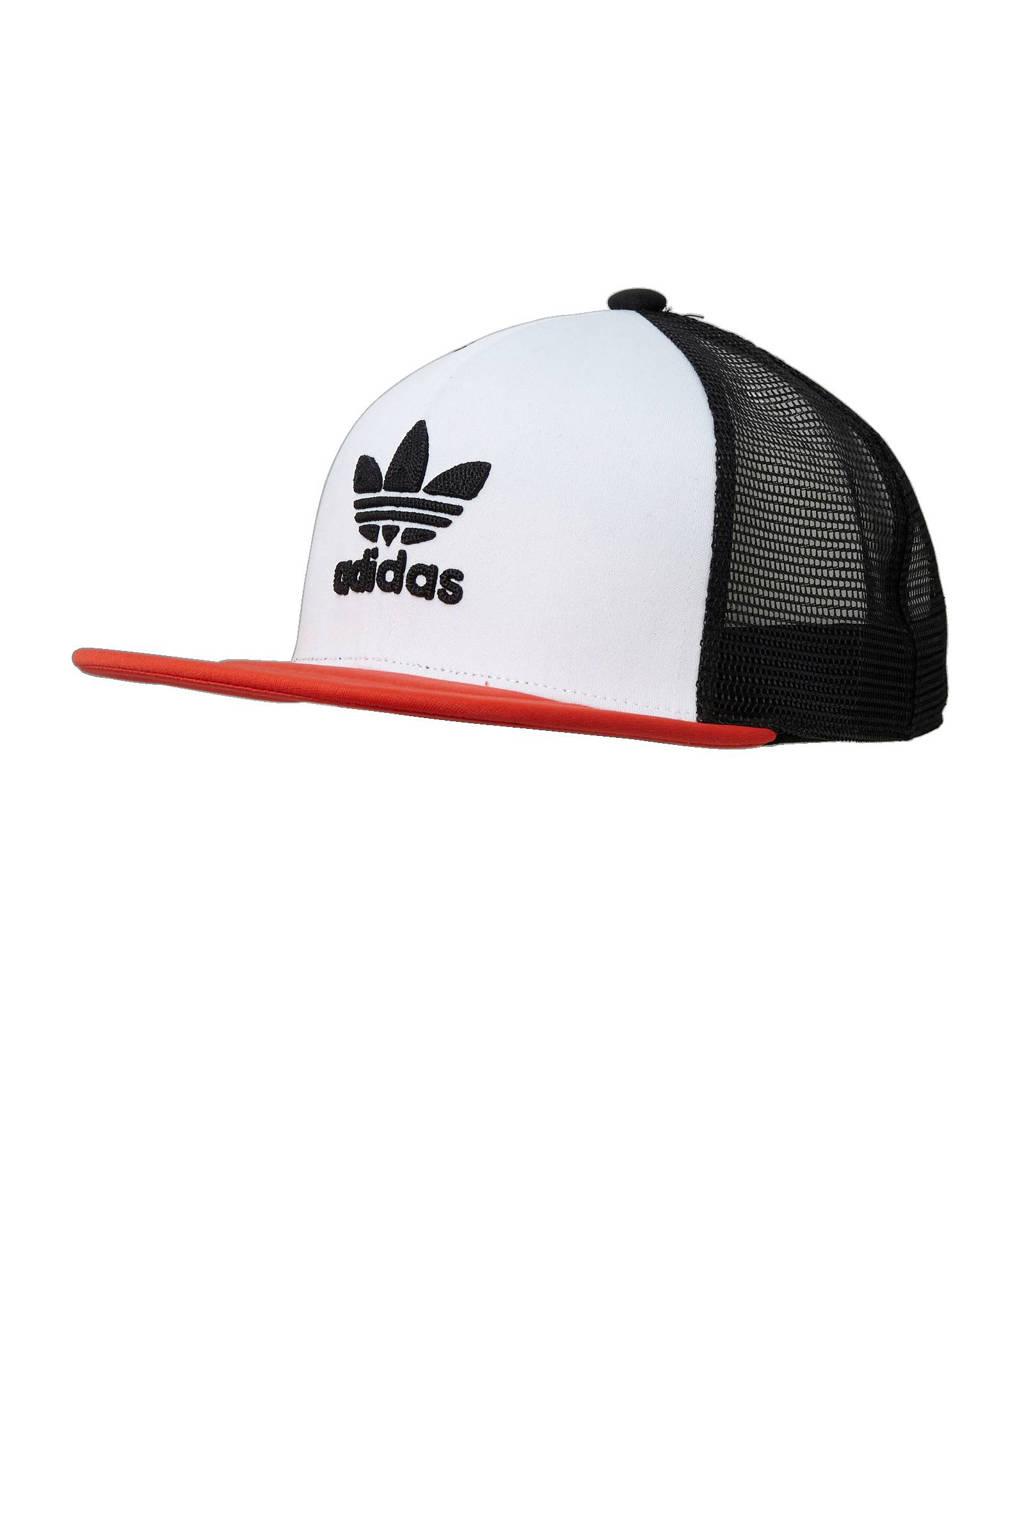 6fb595947e6 adidas originals pet, Wit/ zwart/ rood